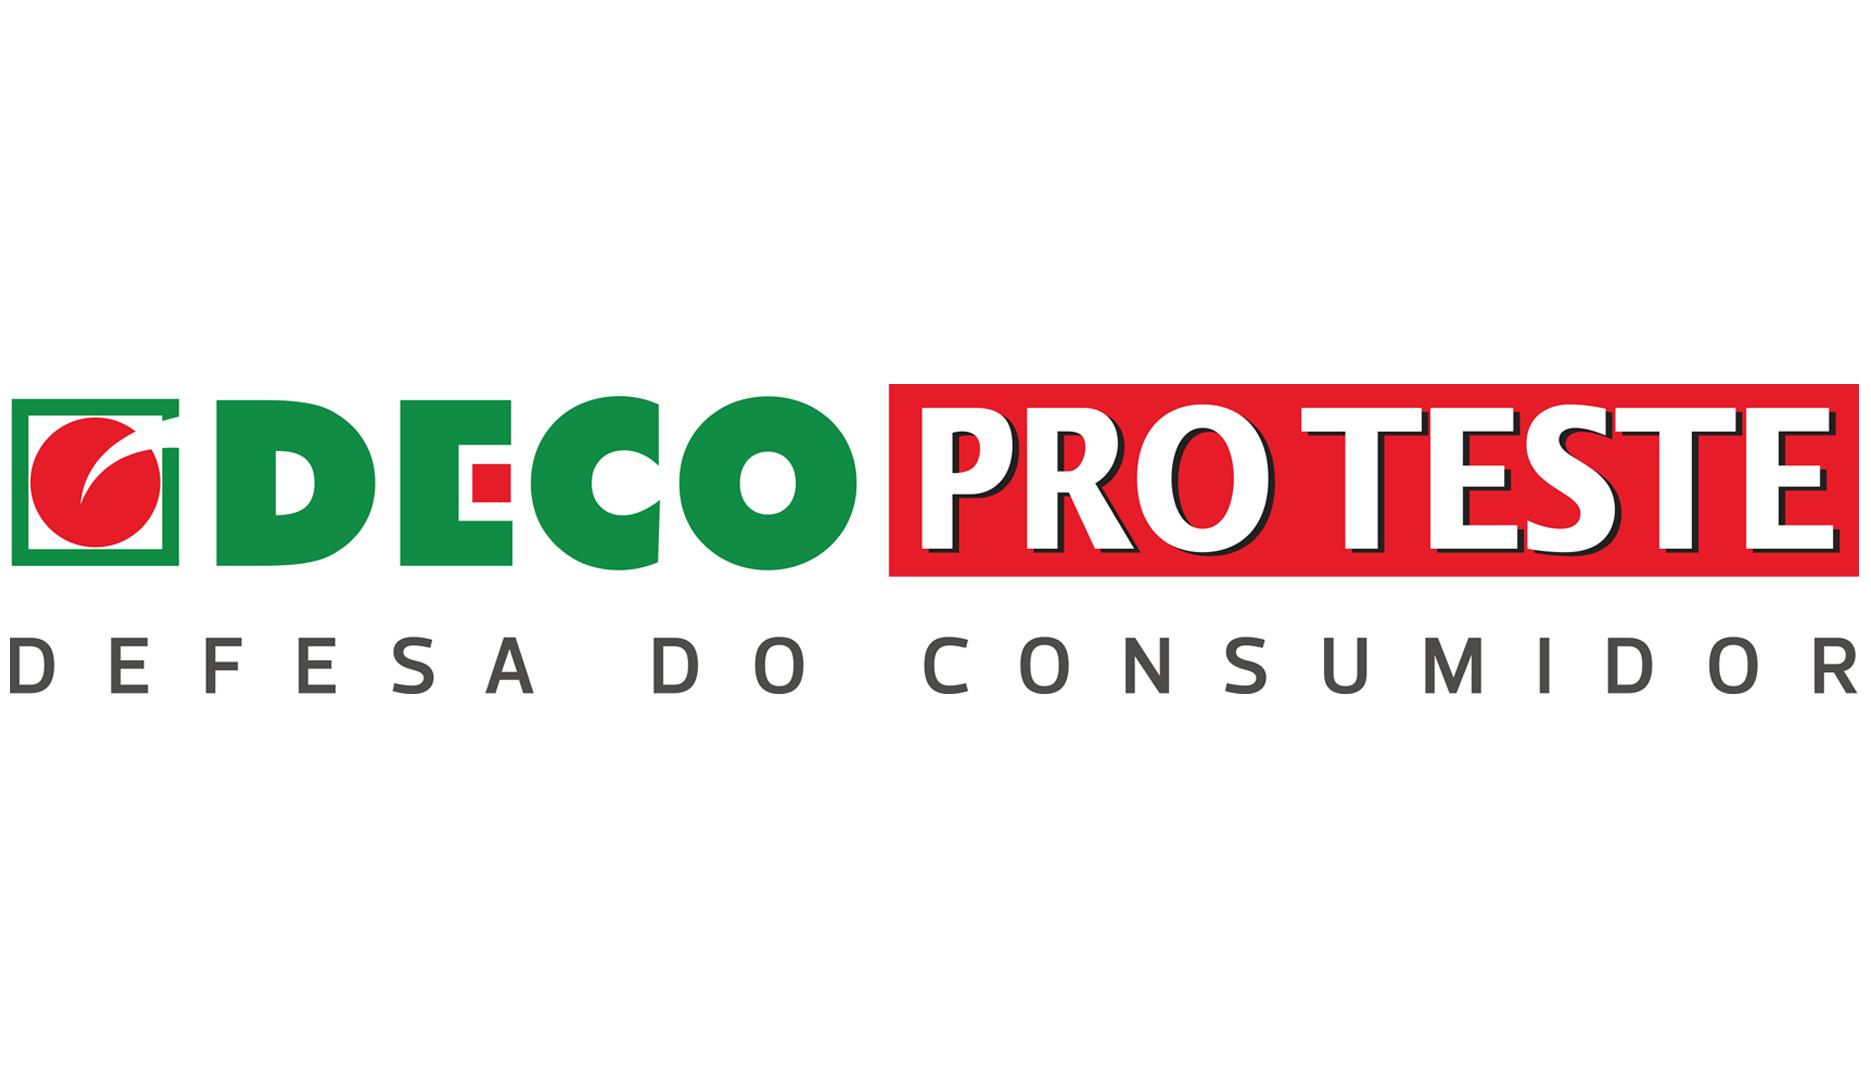 DECO PROTESTE_LOGO